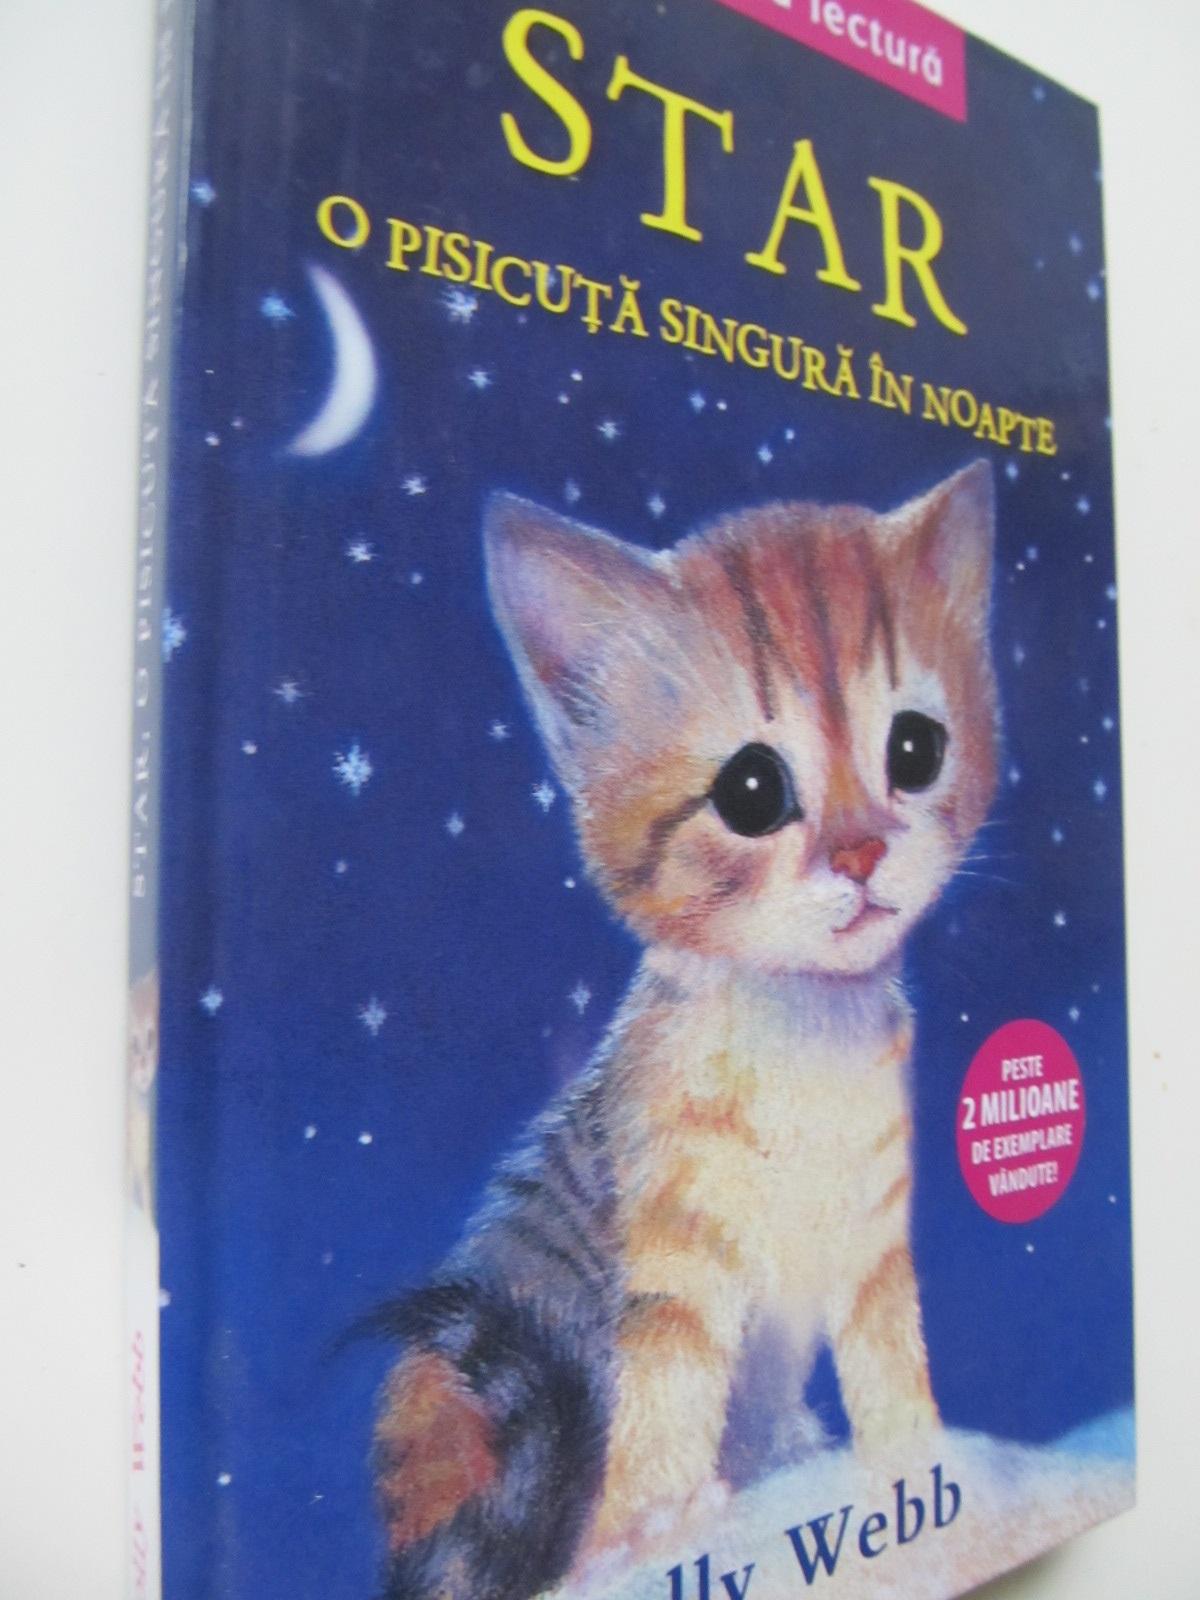 Star O pisicuta singura in noapte - Holly Webb | Detalii carte